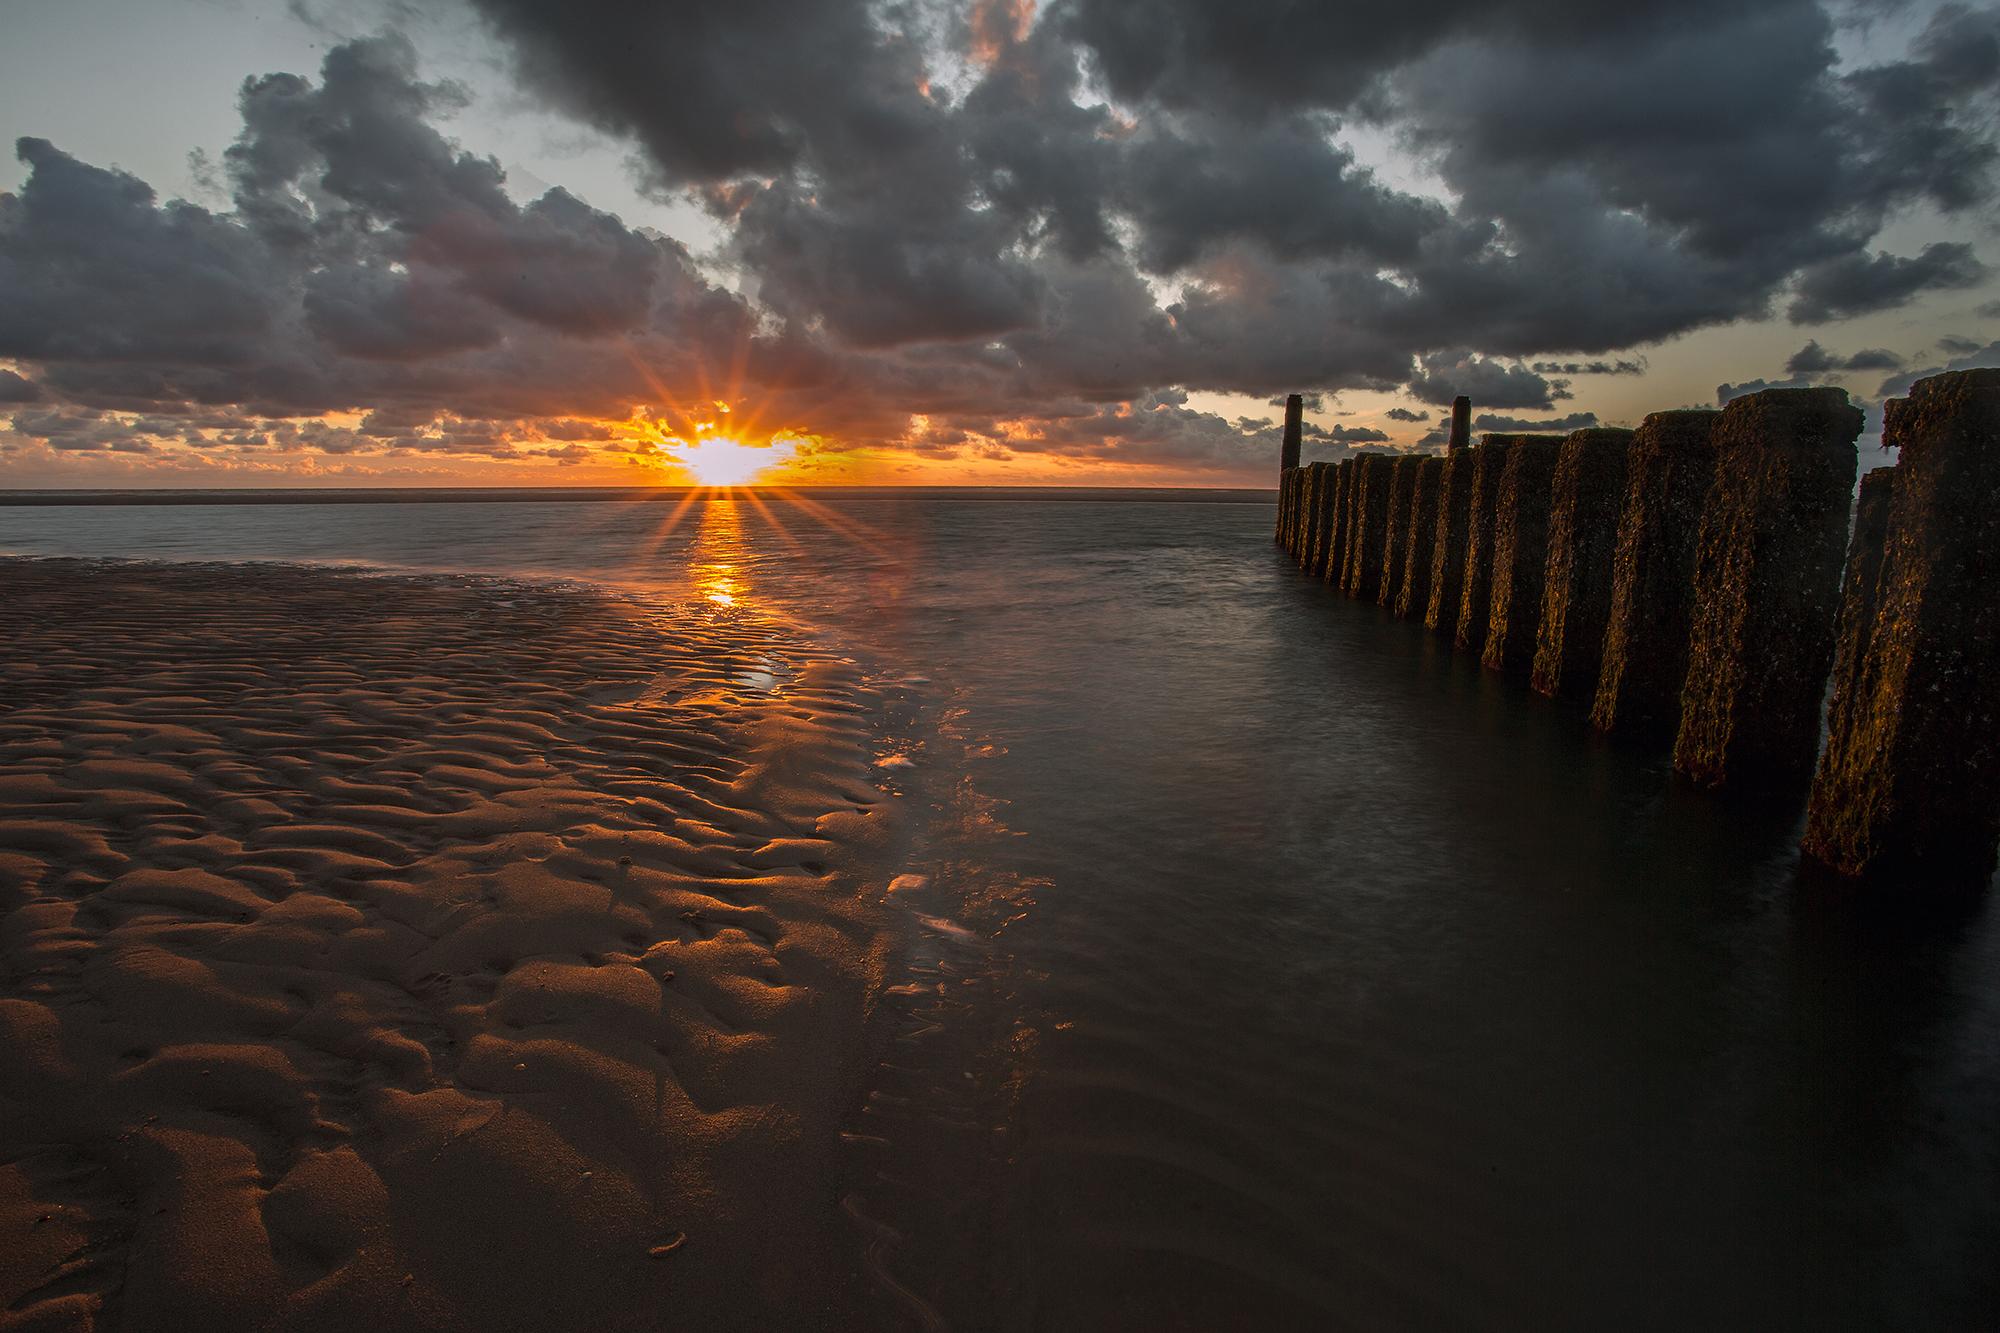 Oostkapelle Beach, Netherlands